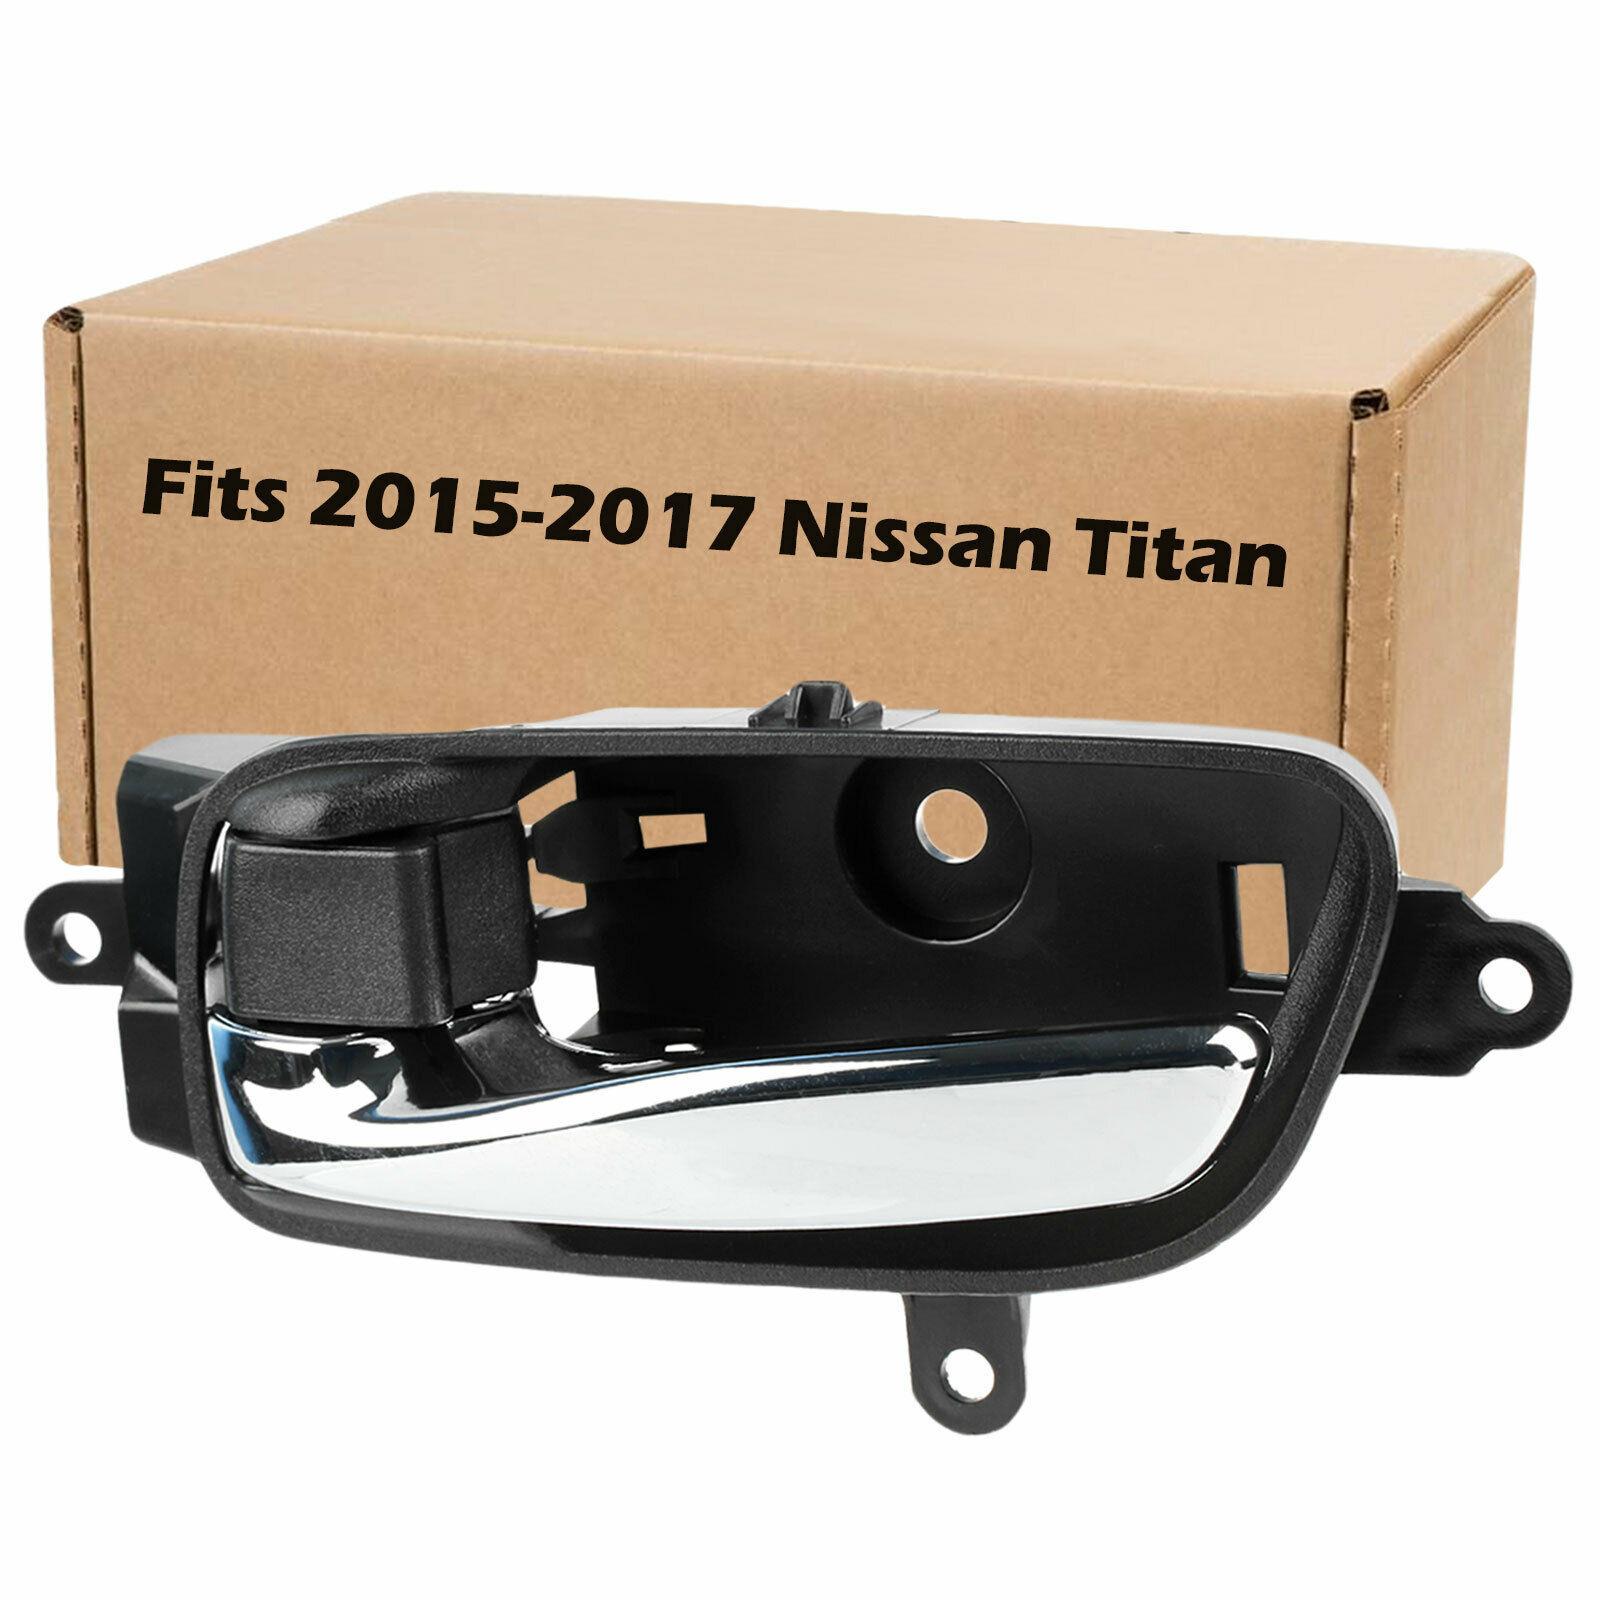 For 2015 2016 2017 Nissan Titan Interior Car Door Handle Front Rear - $9.95